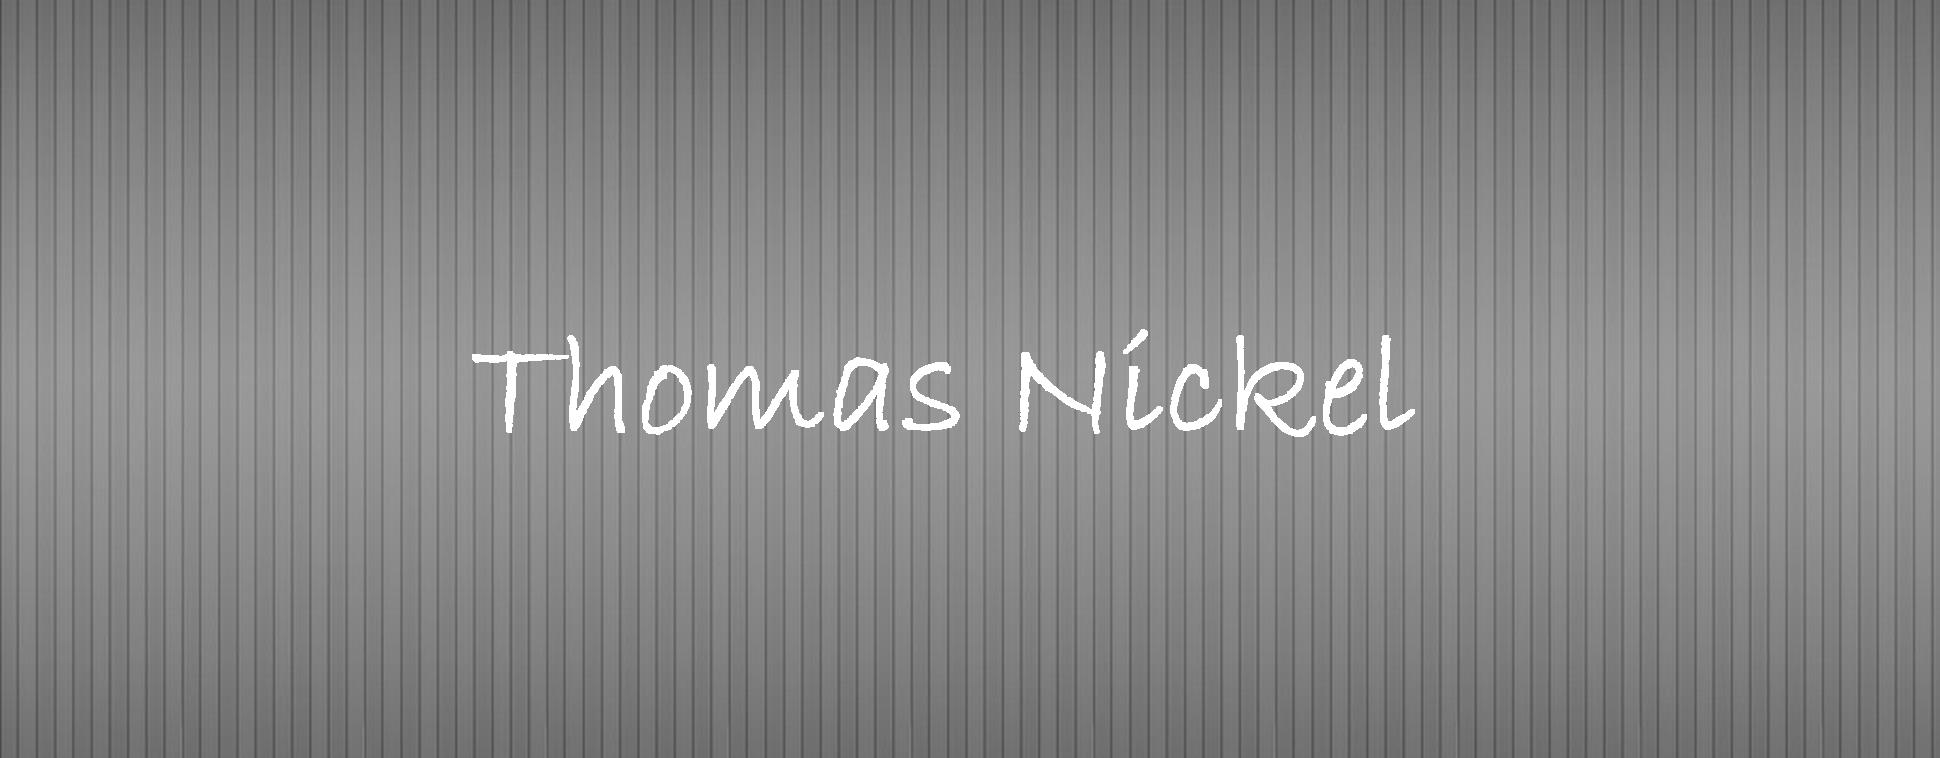 Thomas Nickel.jpg